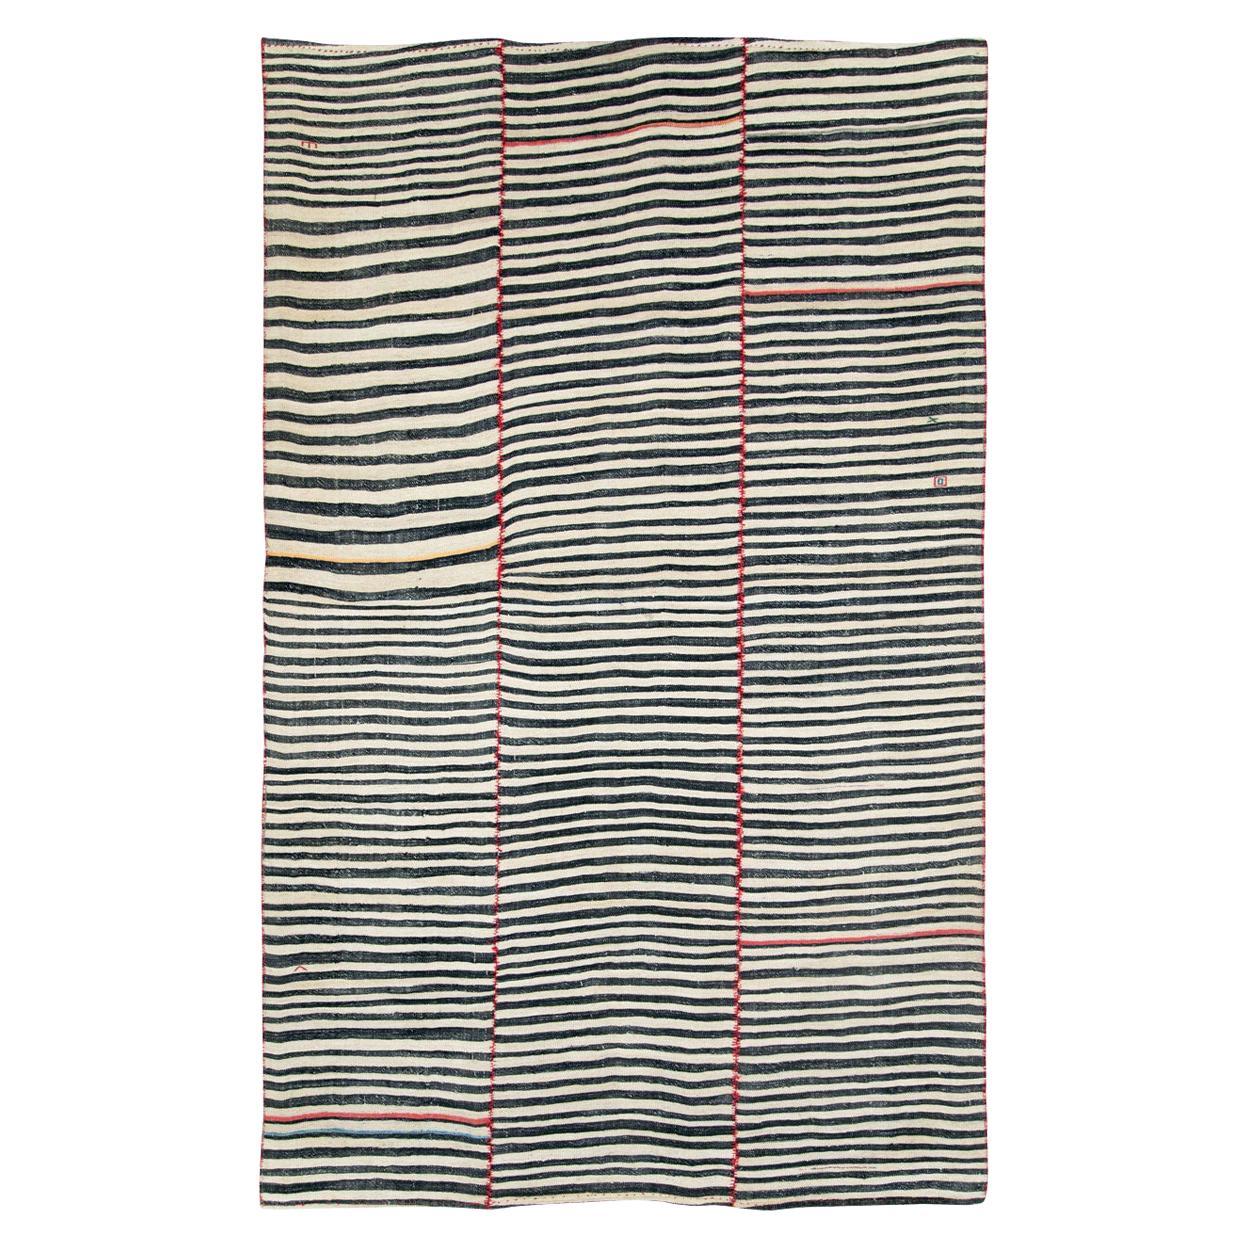 Midcentury Handmade Tribal Persian Zebra Striped Flat-Weave Accent Rug